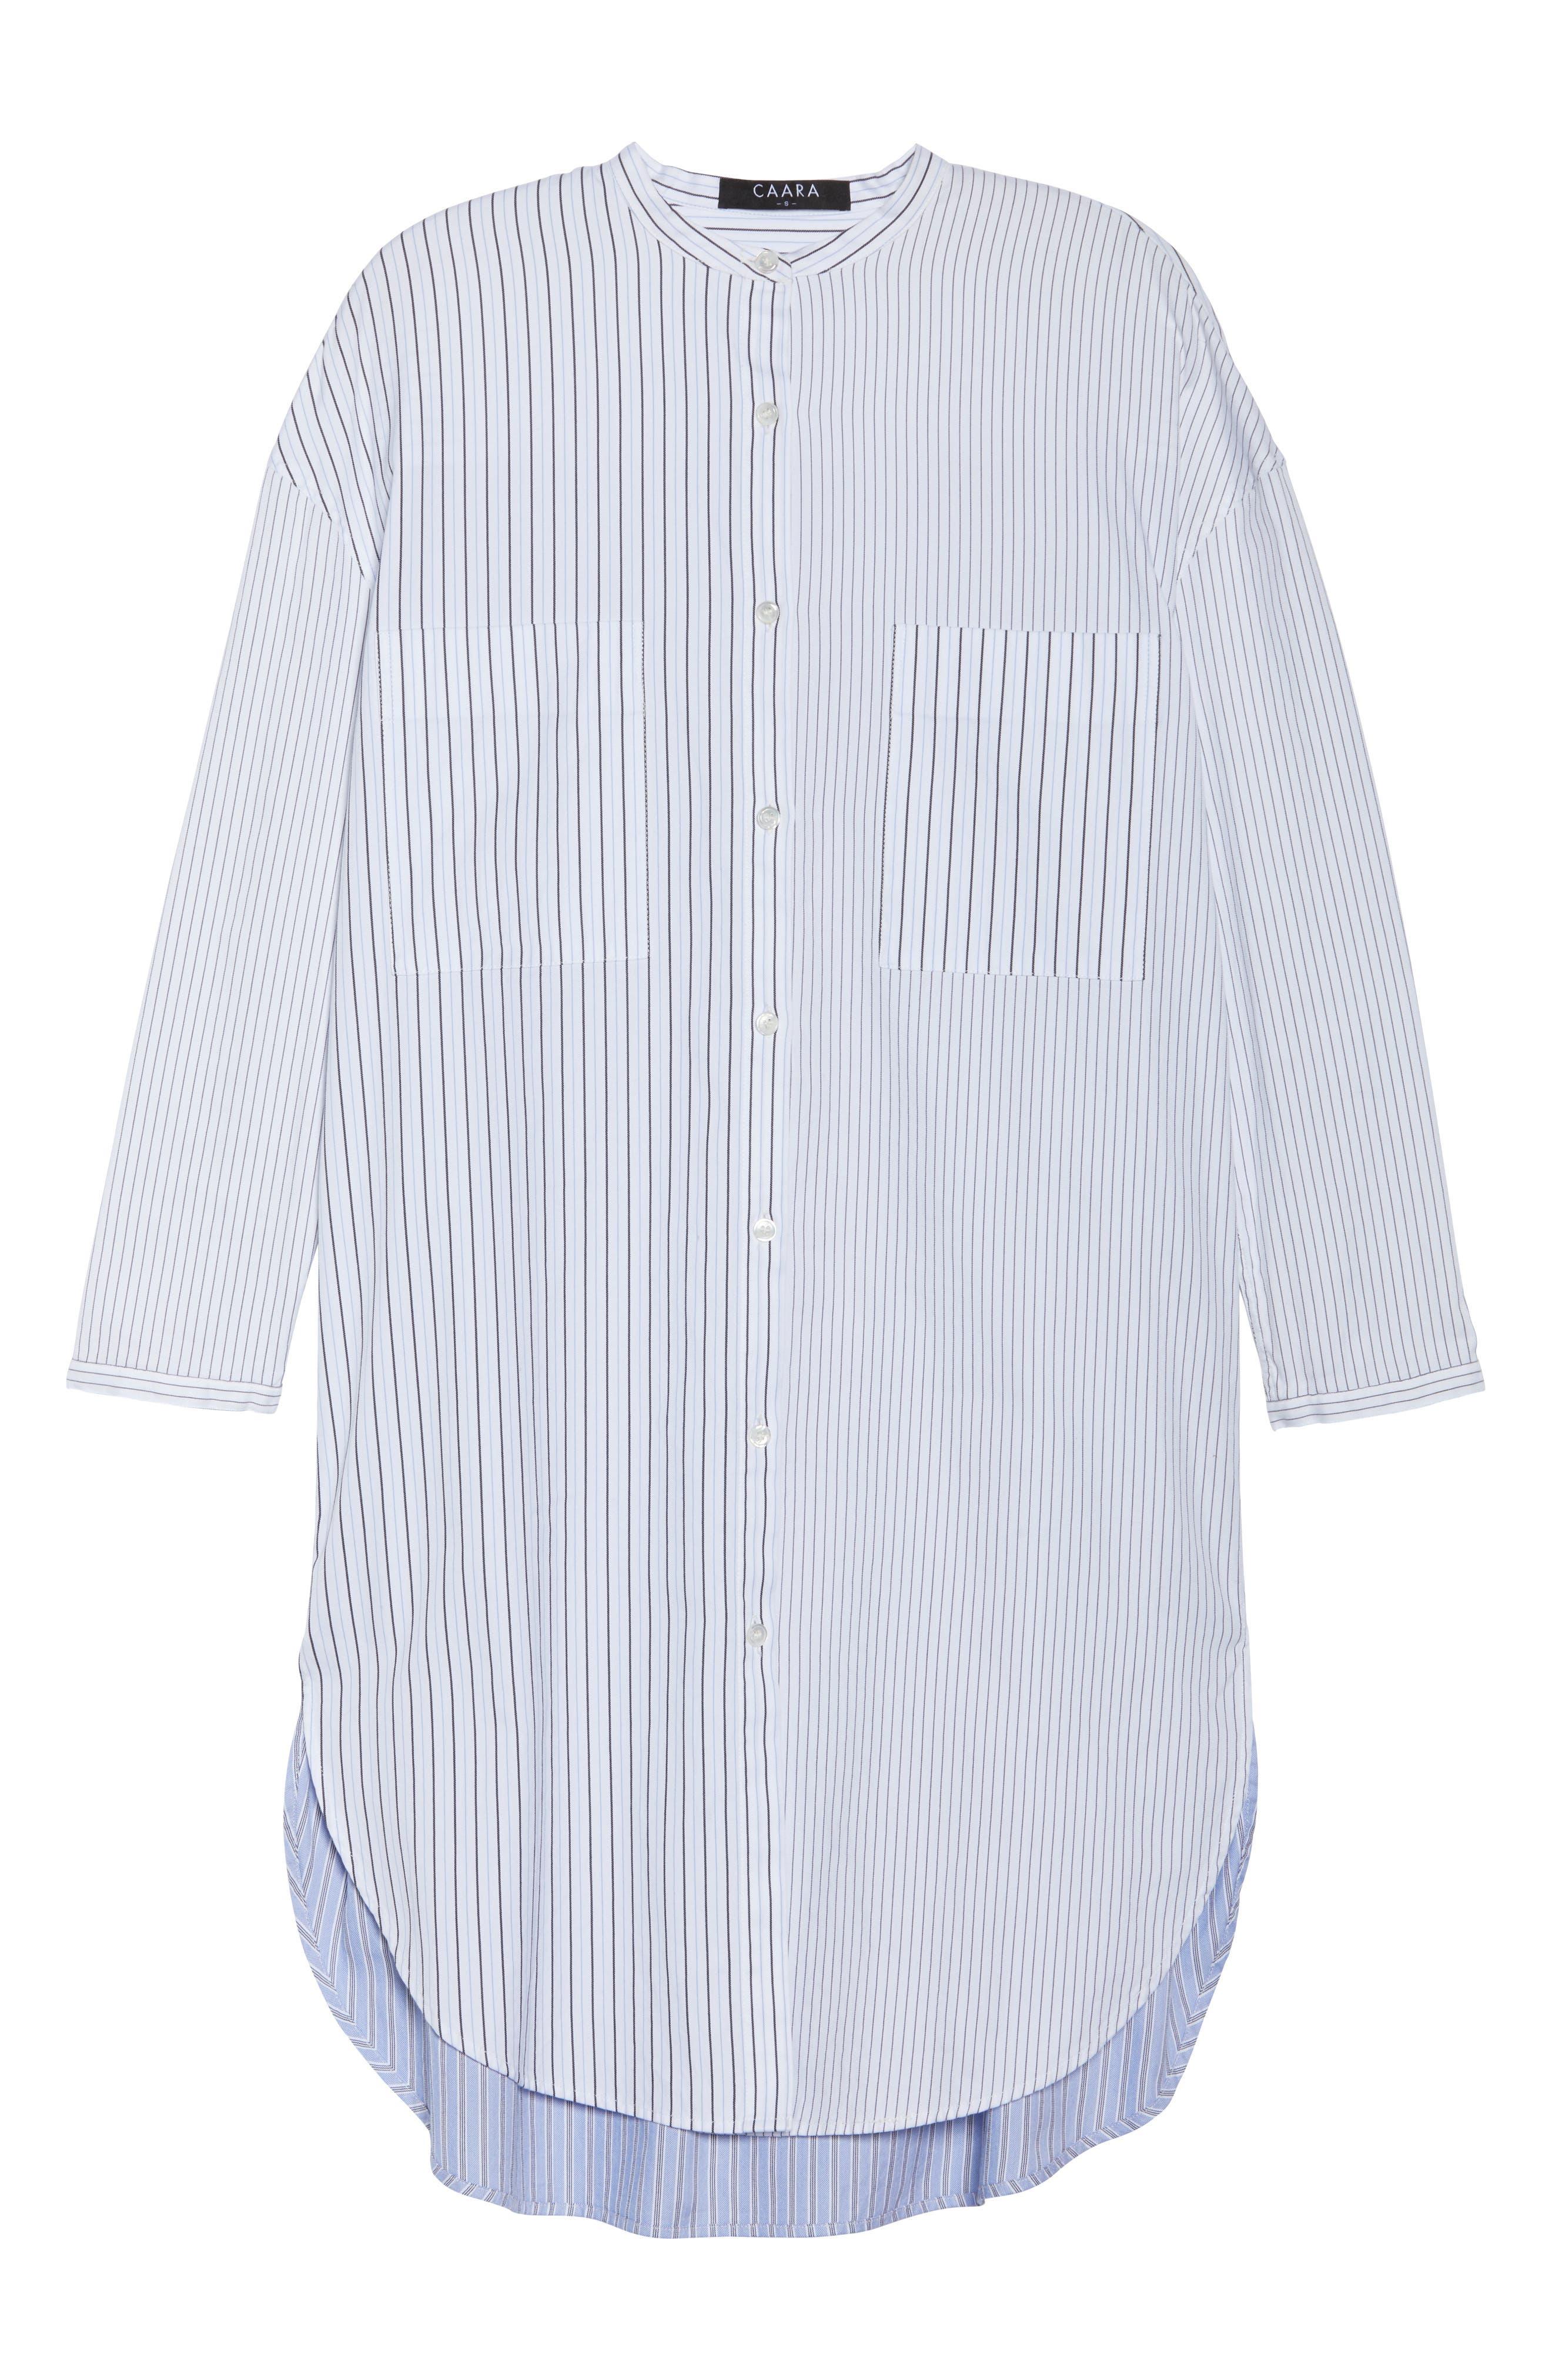 Tia Stripe Shirtdress,                             Alternate thumbnail 6, color,                             160